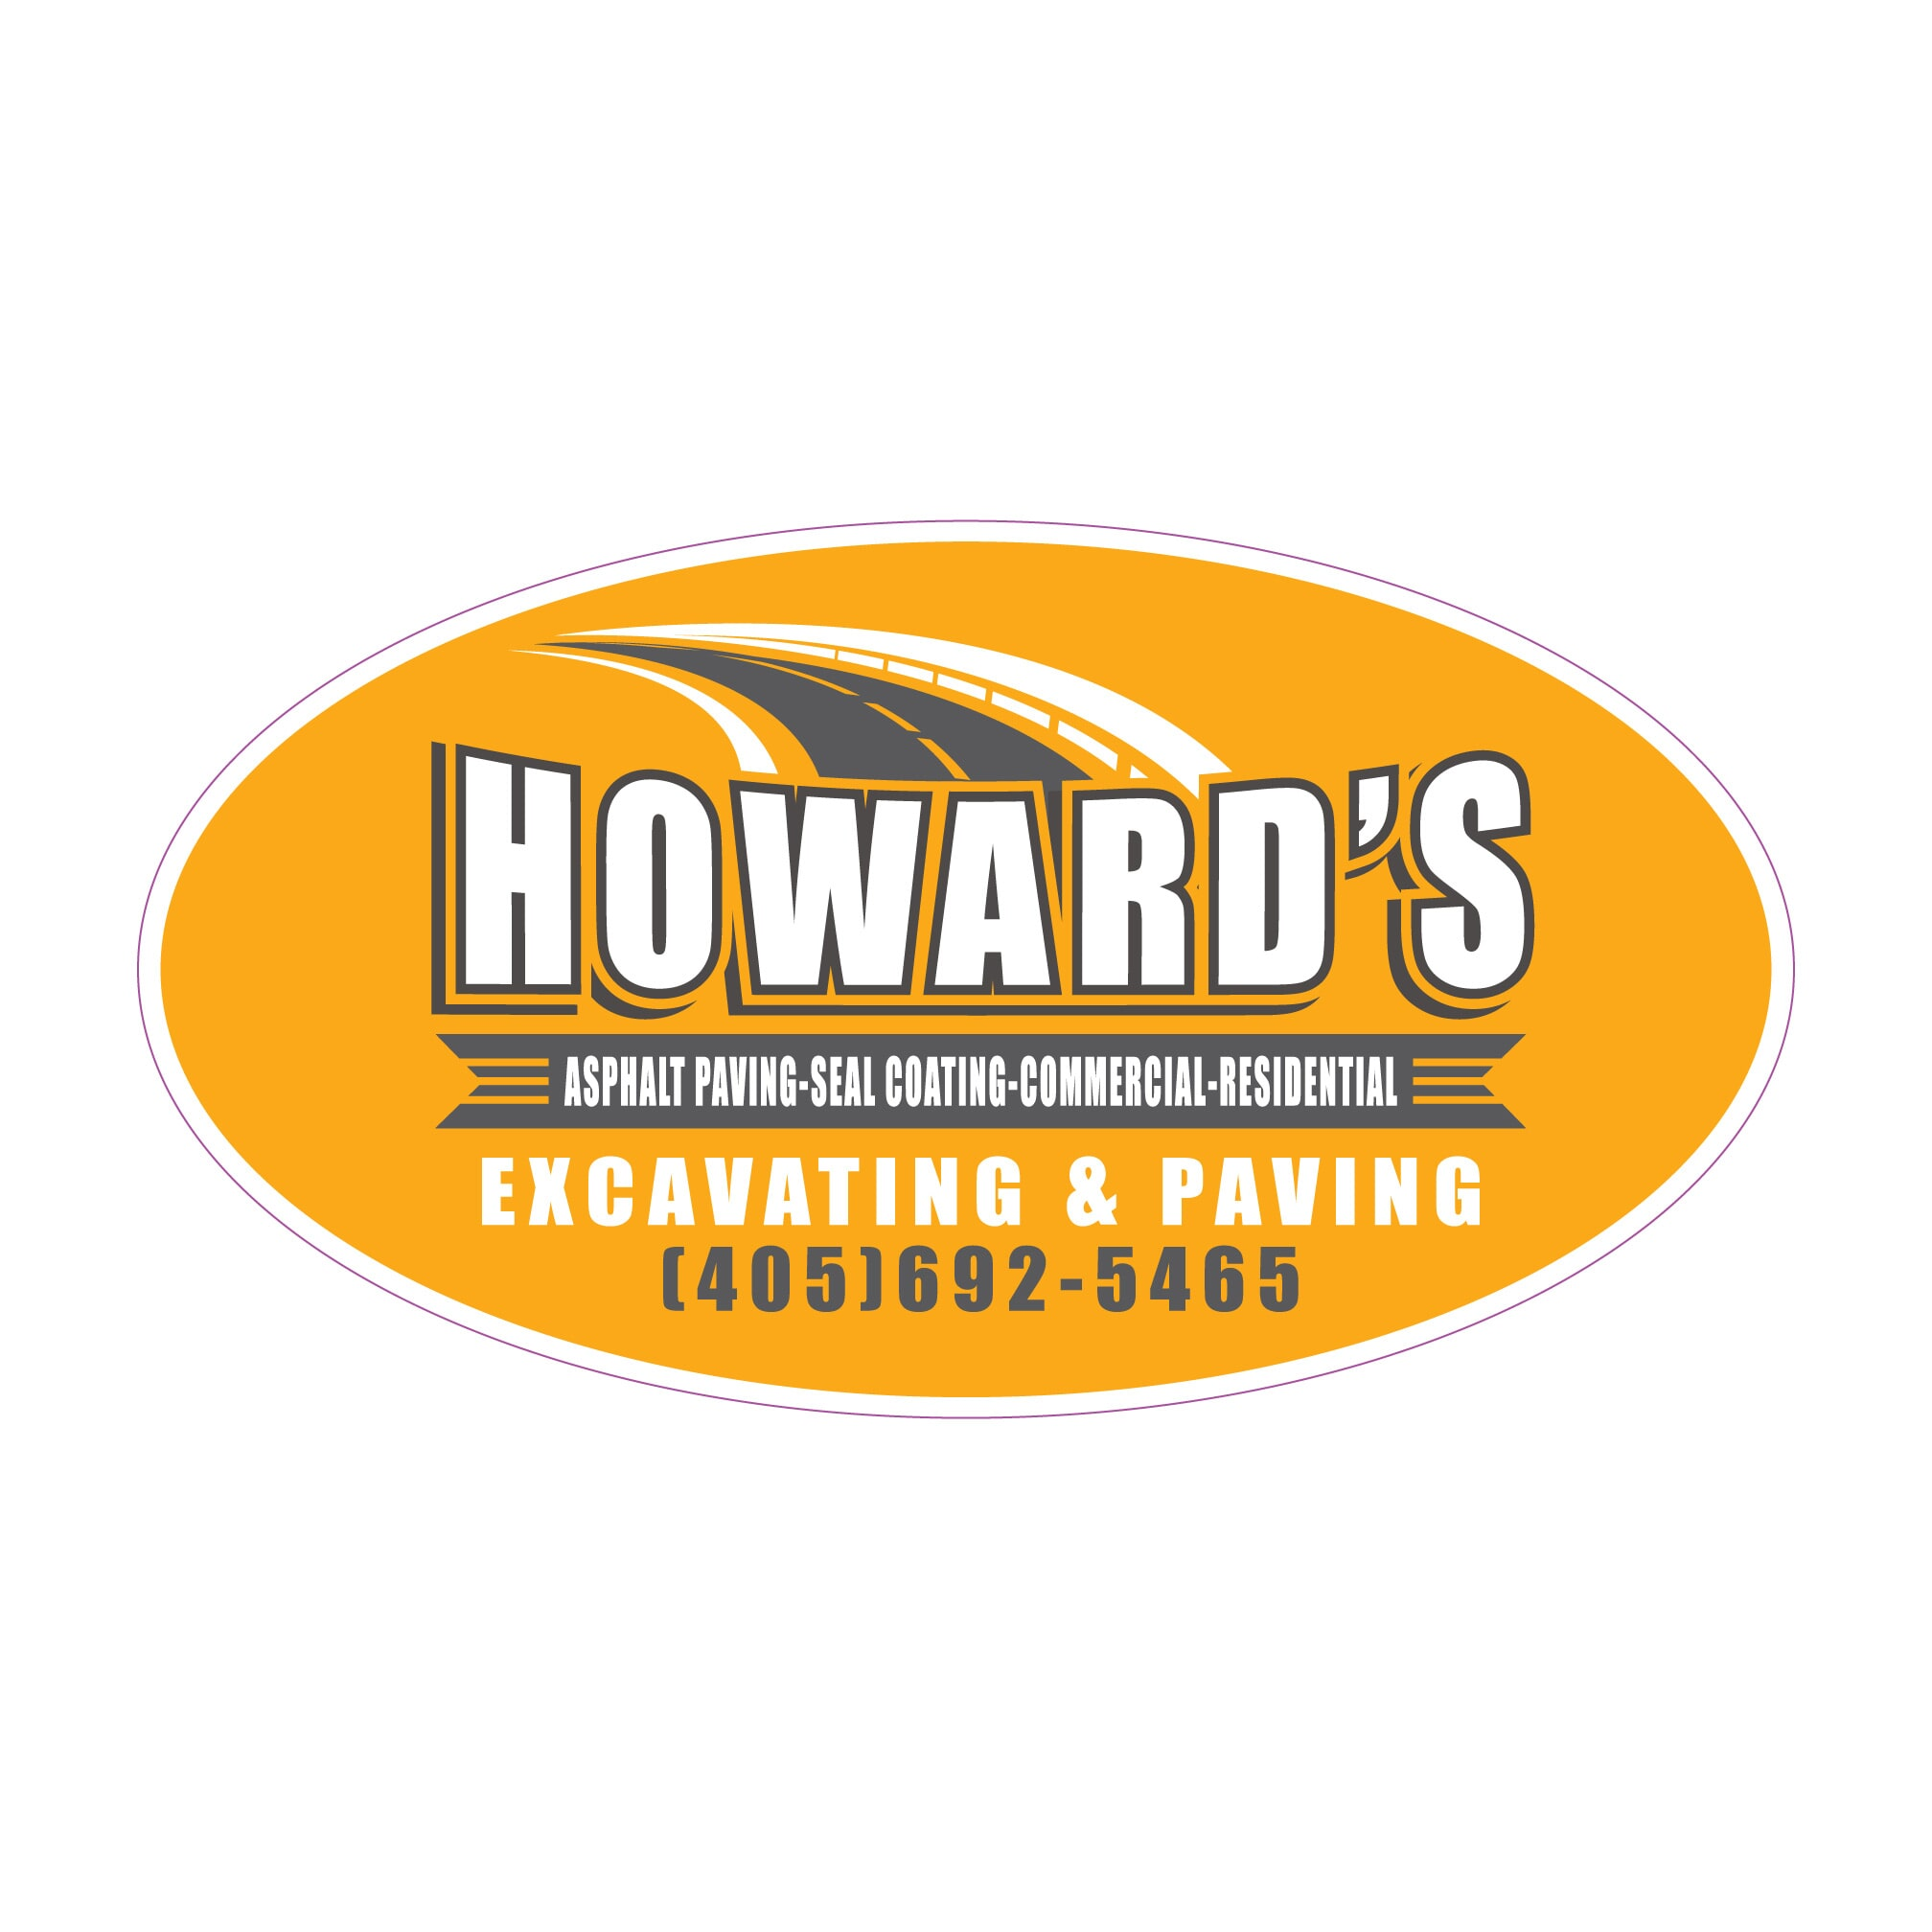 Howard's Excavating & Paving Logo